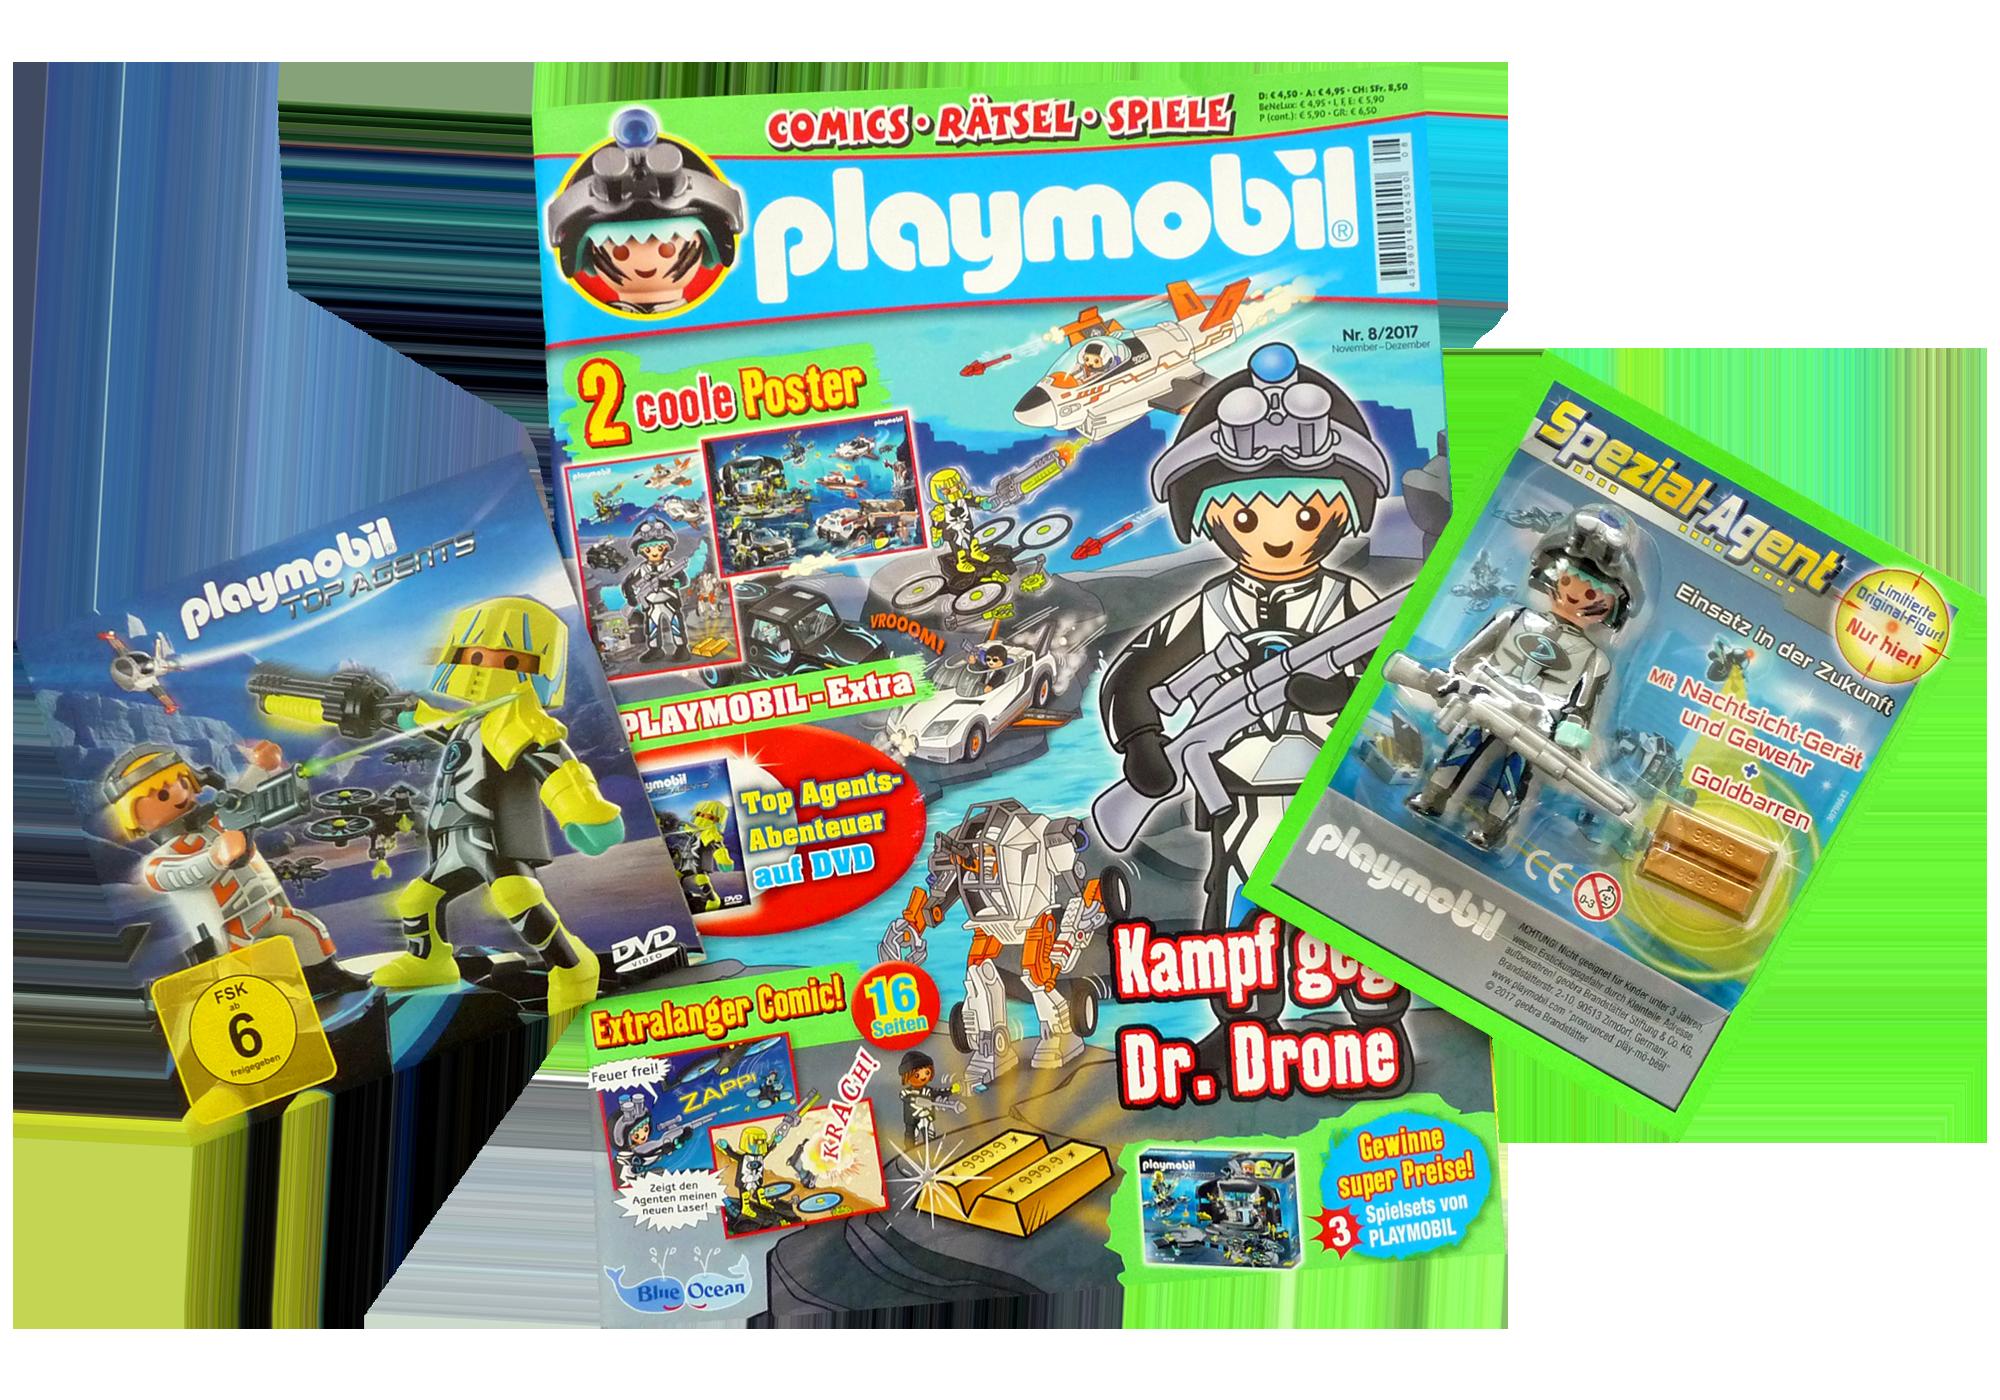 http://media.playmobil.com/i/playmobil/80597_product_detail